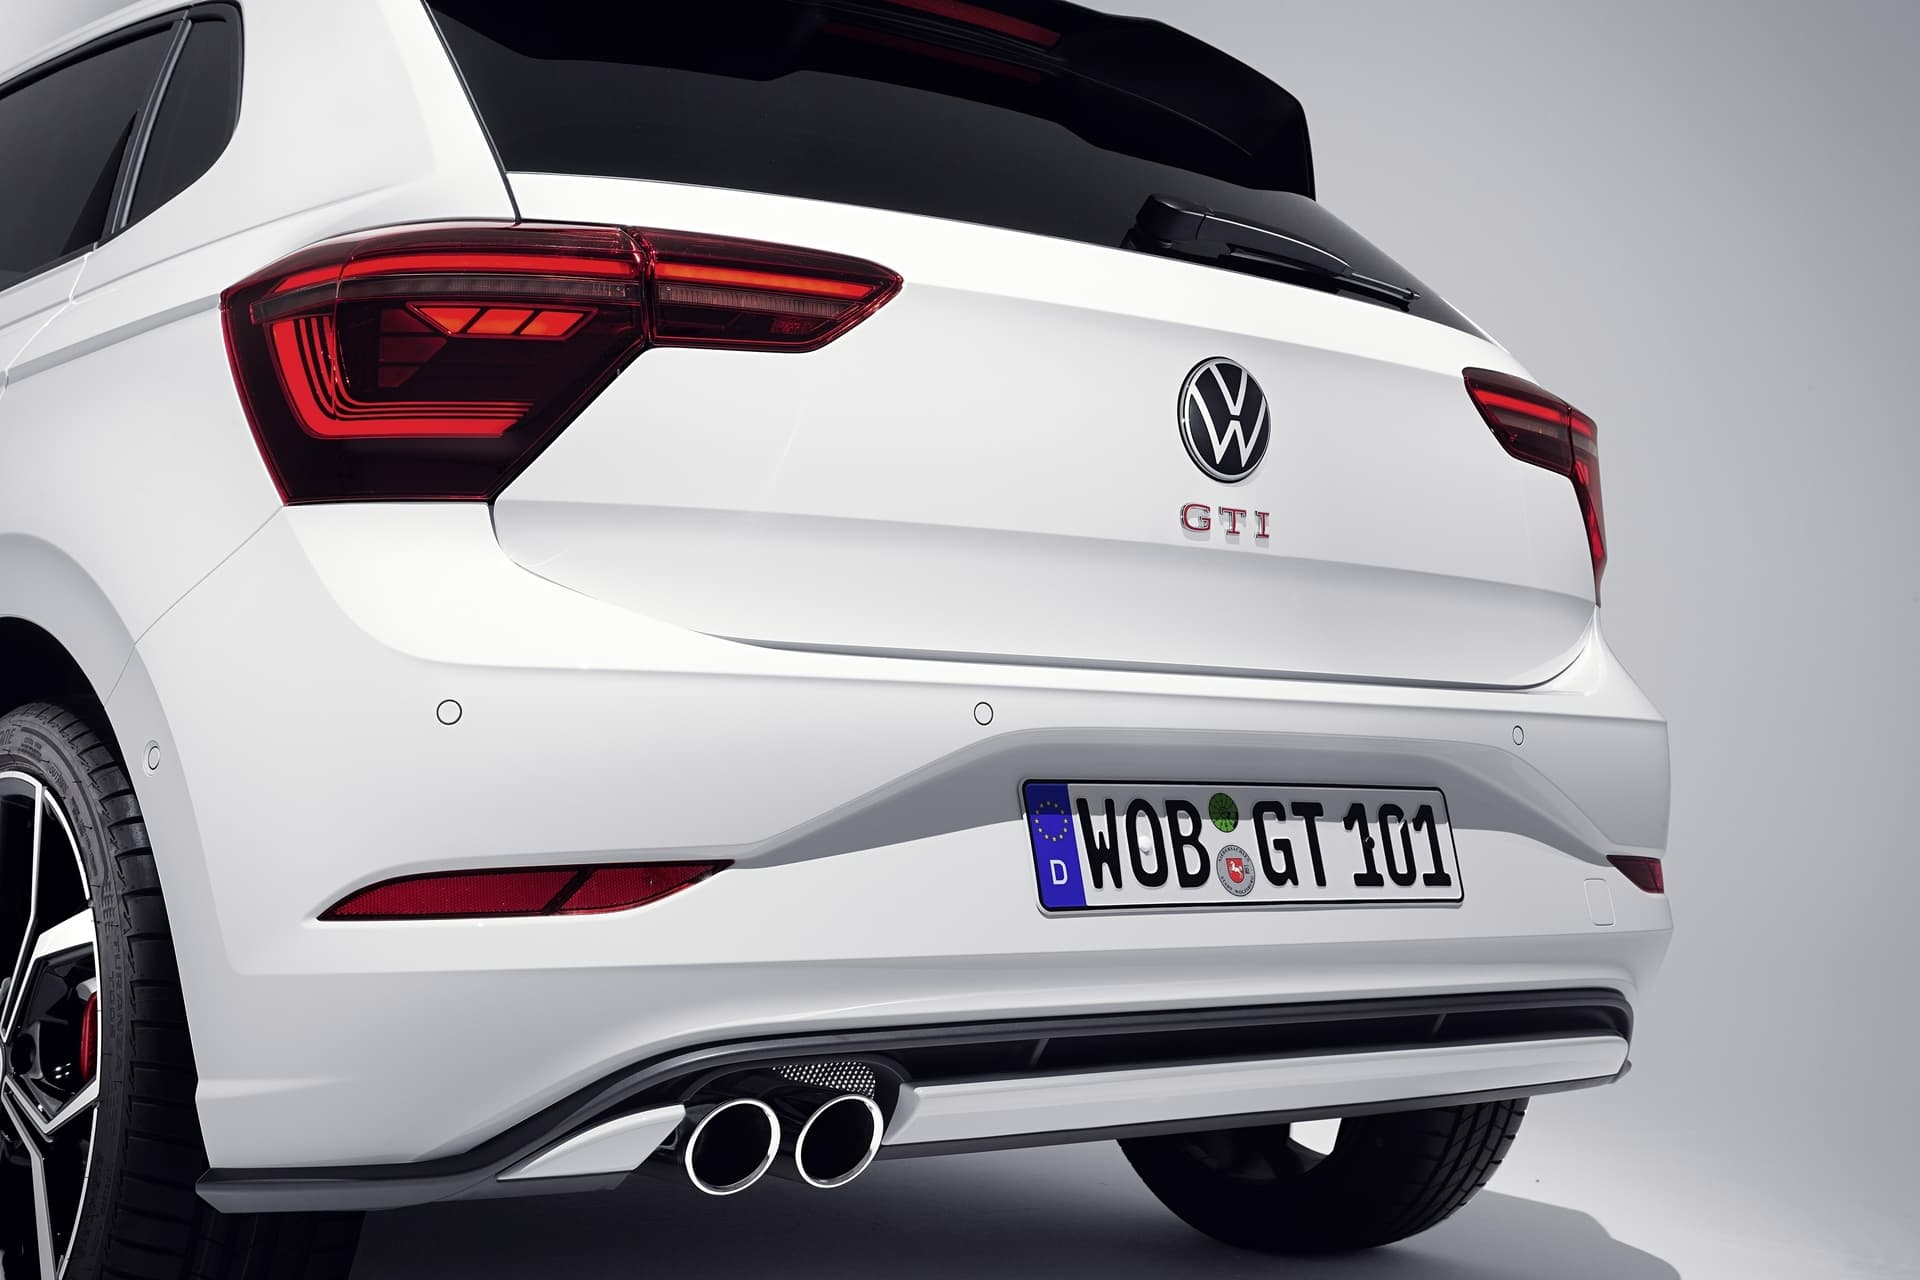 Volkswagen Polo Gti 2022 0621 022